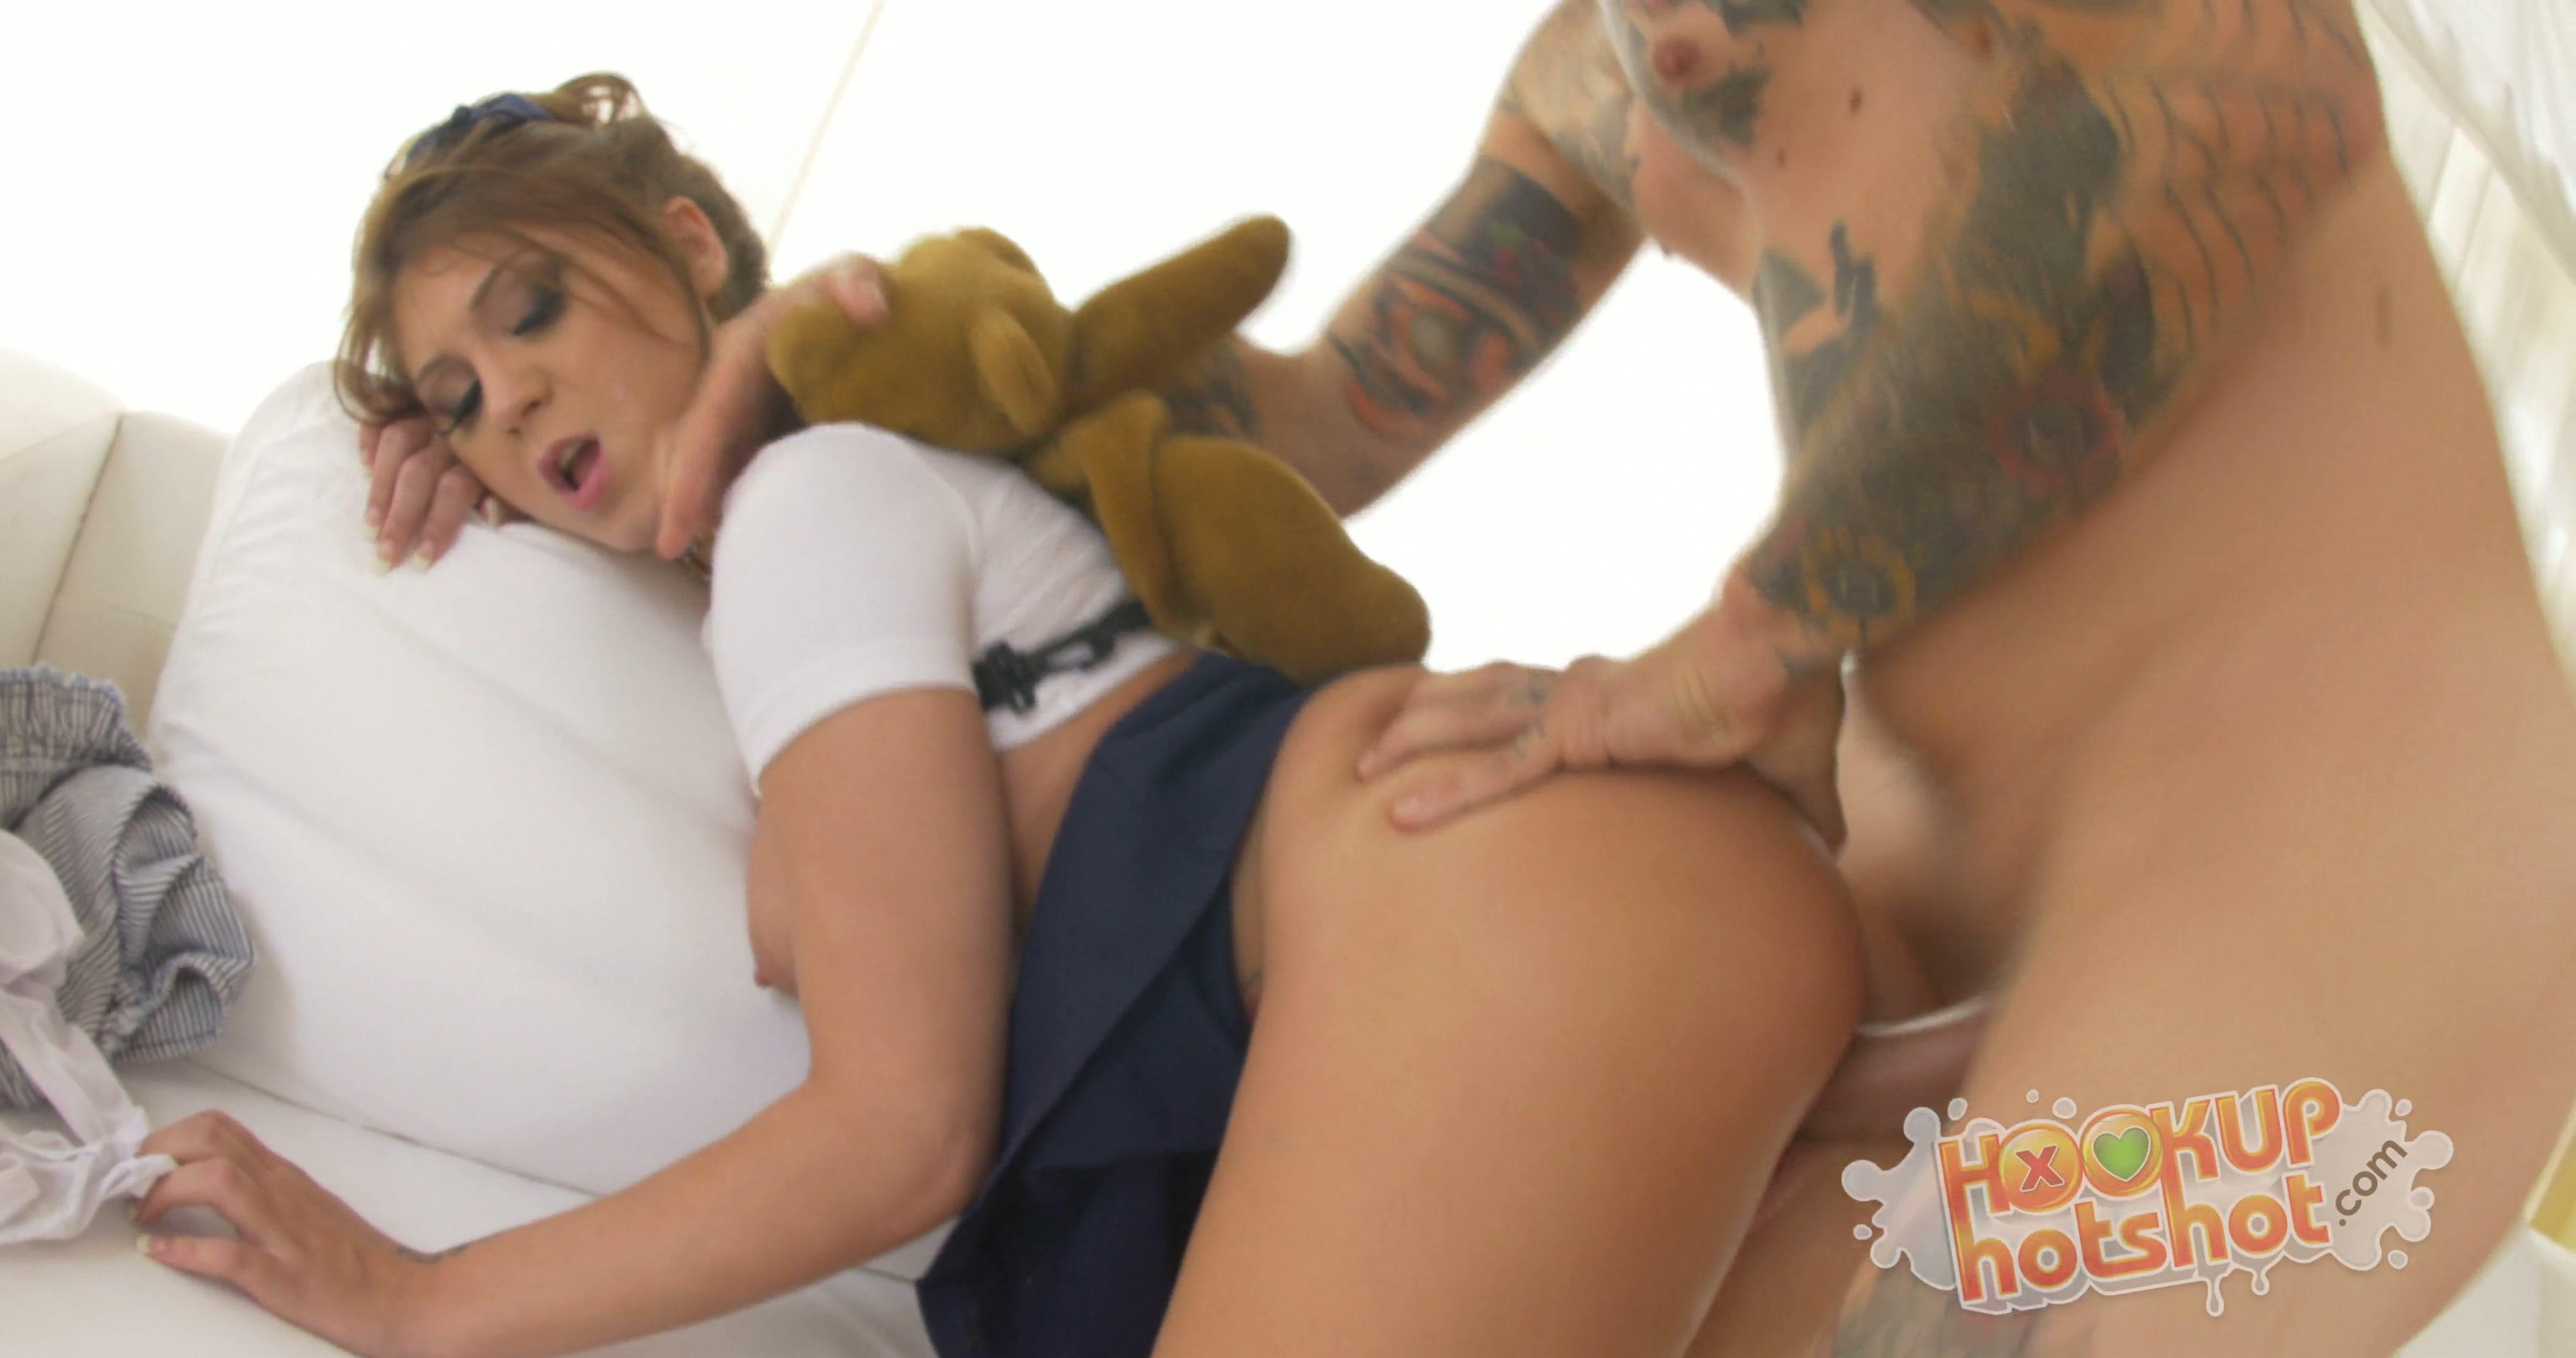 james threesomes nikita von hamster